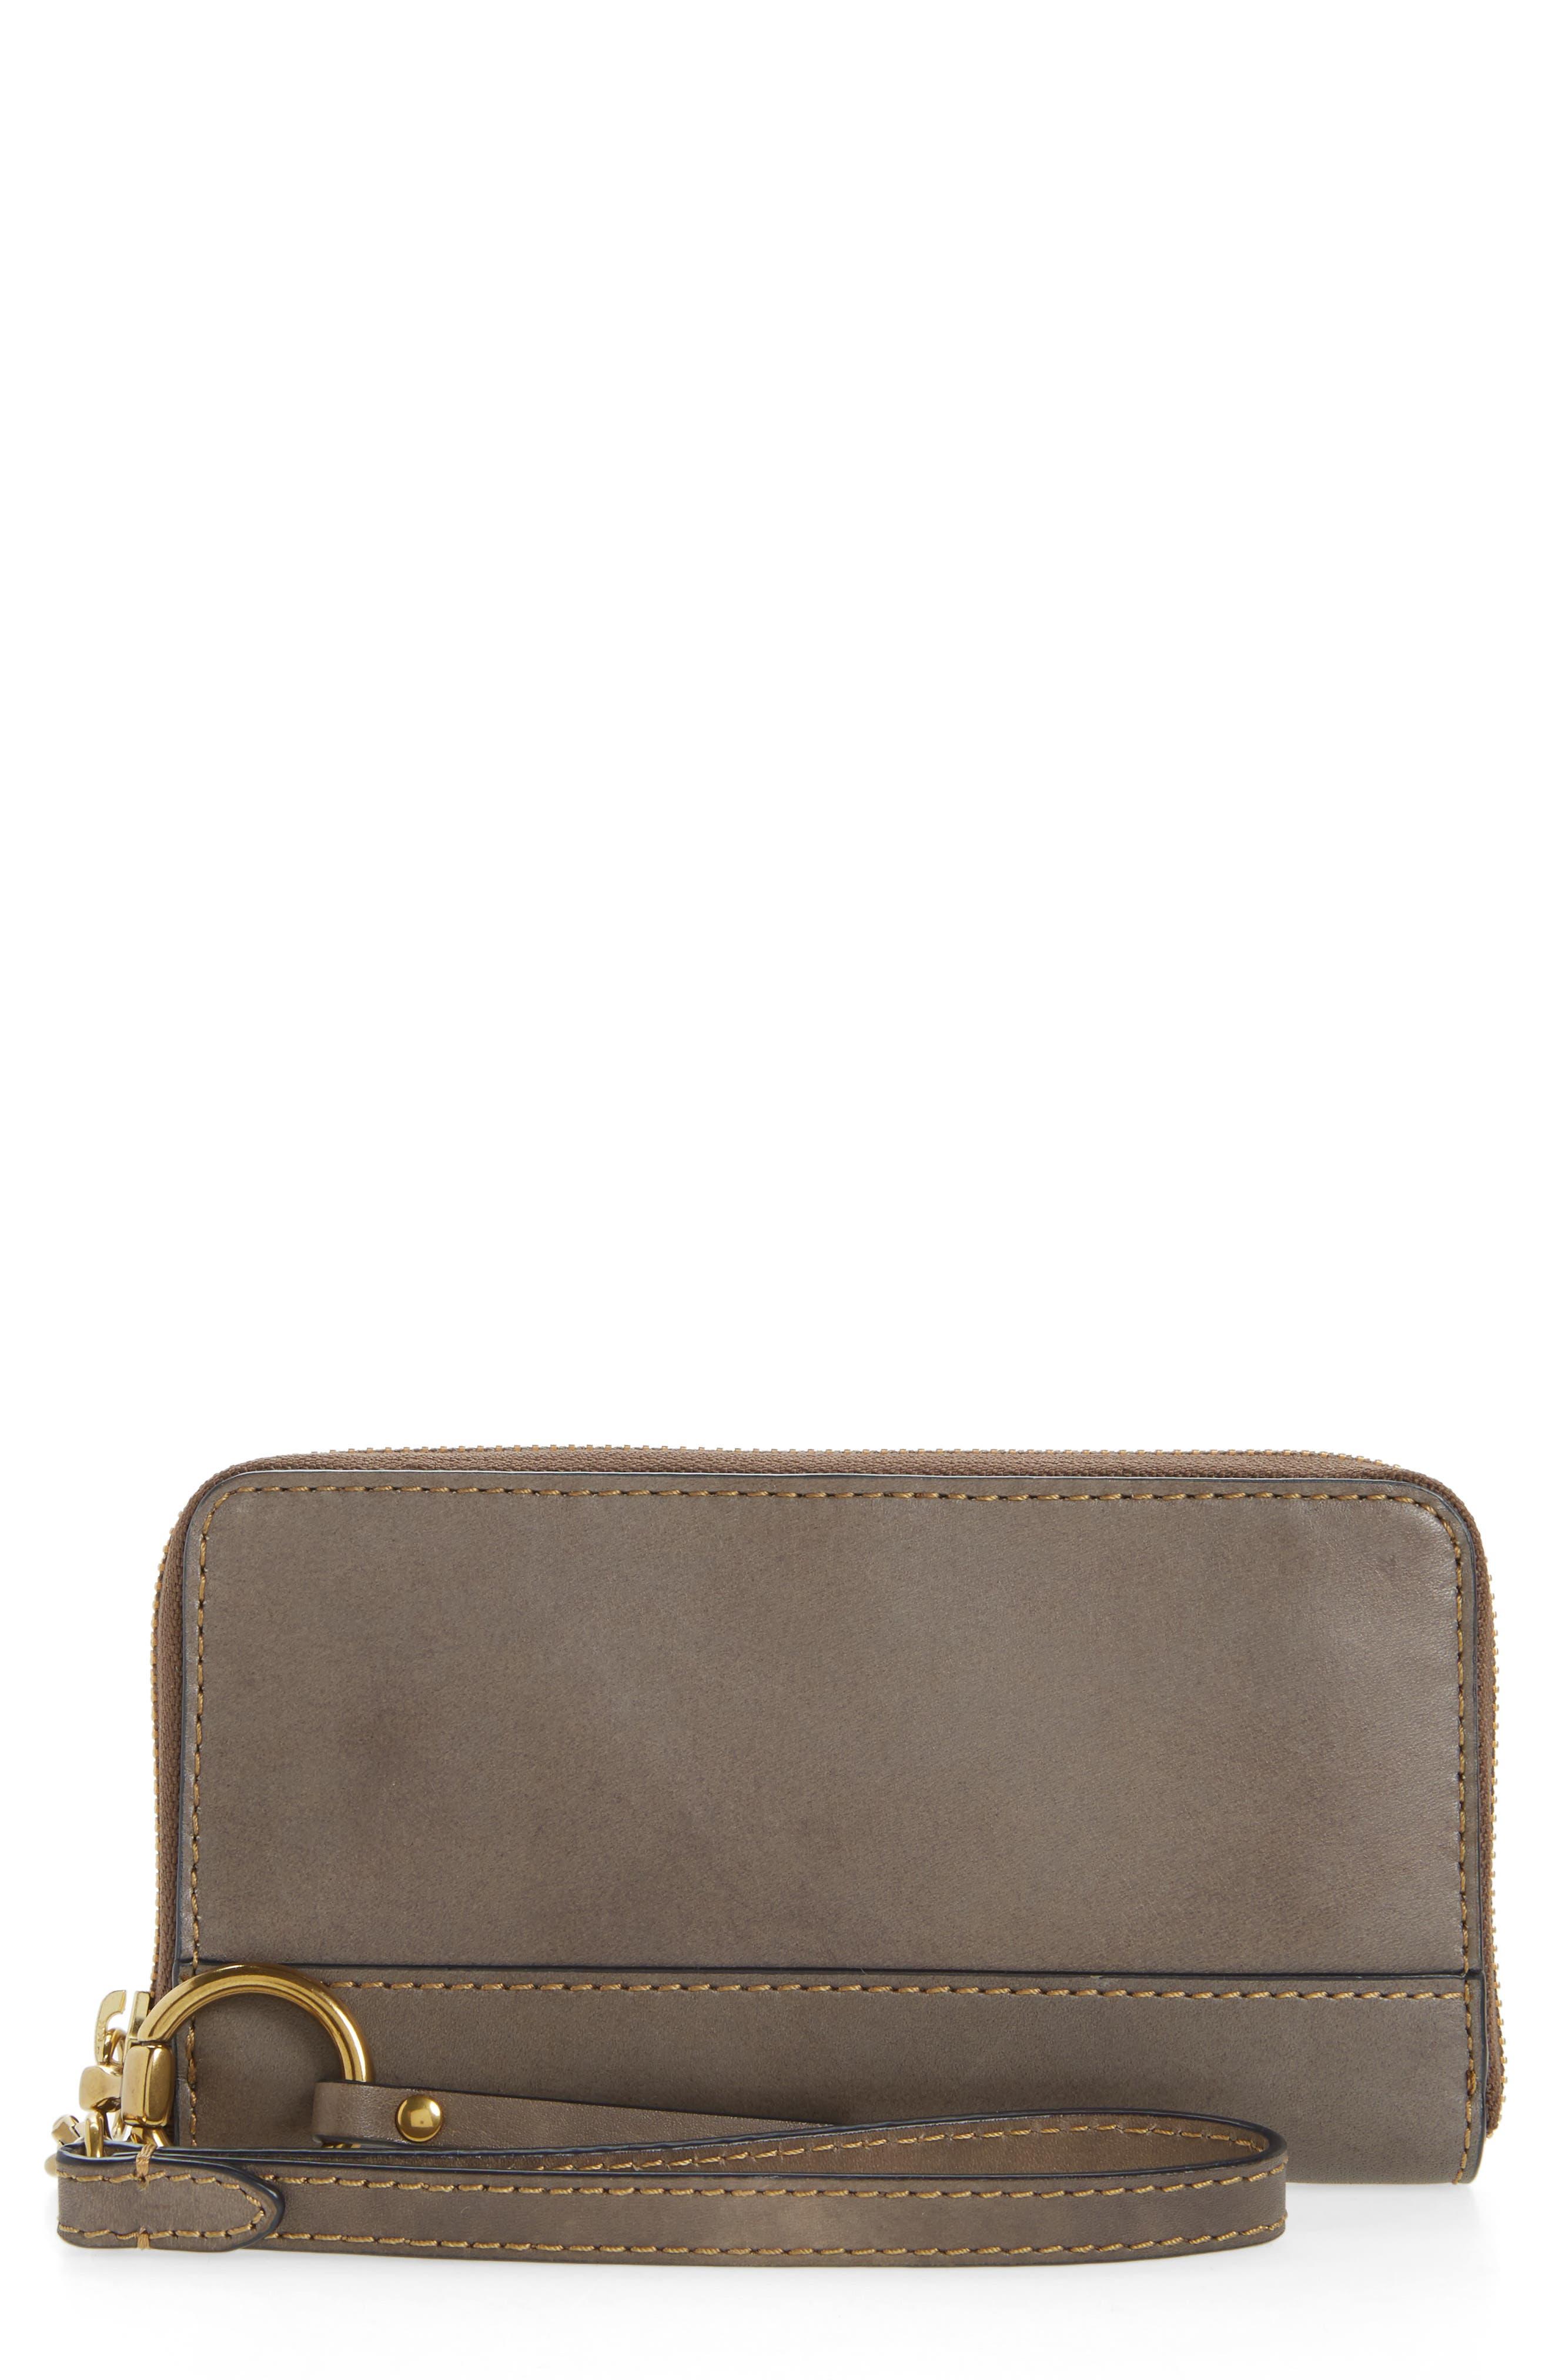 Ilana Harness Phone Leather Zip Wallet,                             Main thumbnail 1, color,